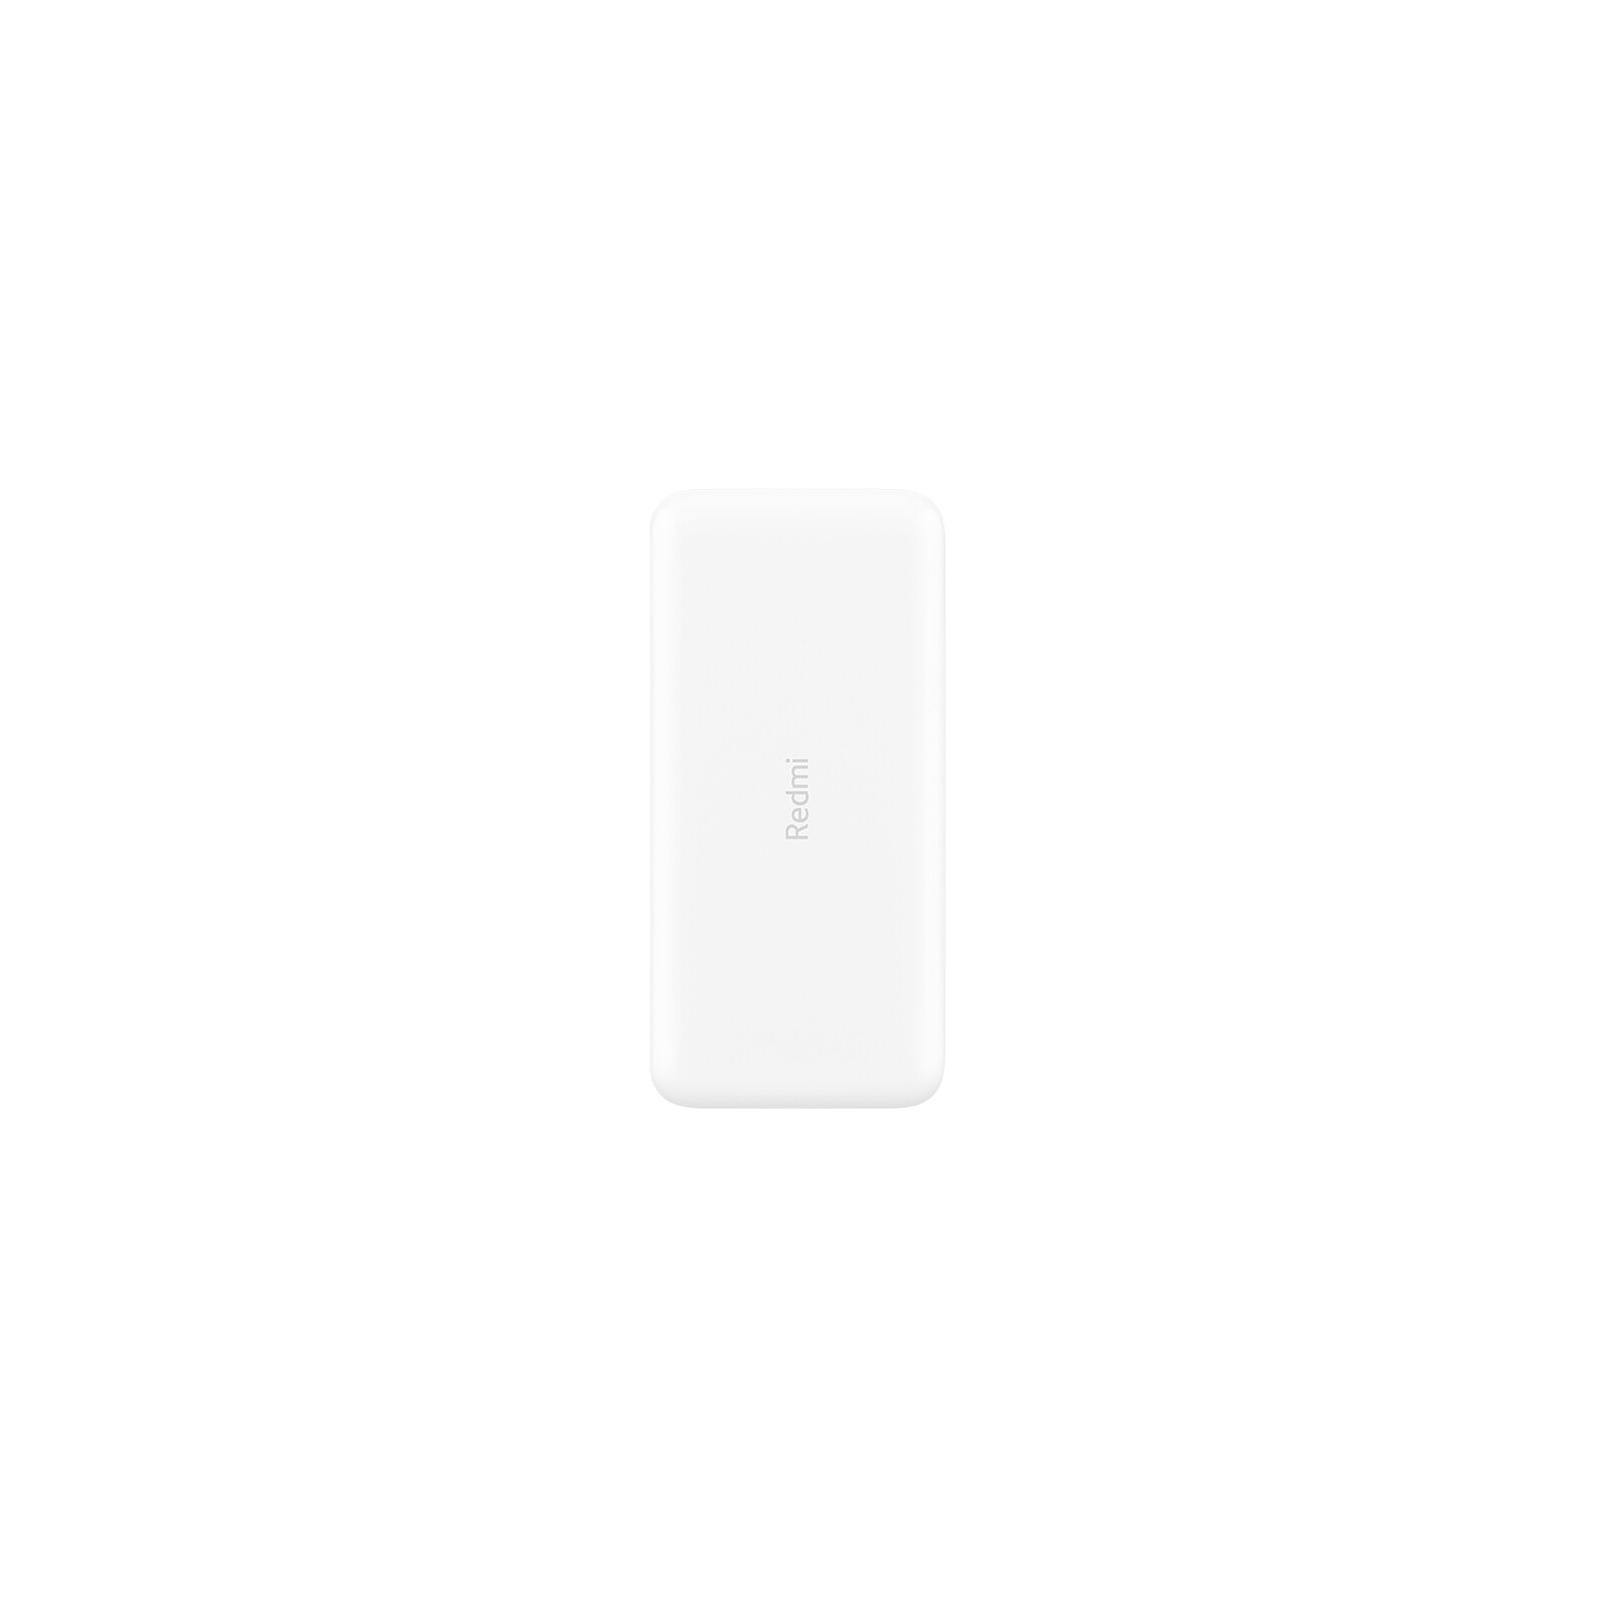 Батарея универсальная Xiaomi Redmi 20000mAh (in 2.1A Micro-USB,Type-C/ out 2*2.4A) White (VXN4265CN / VXN4285)